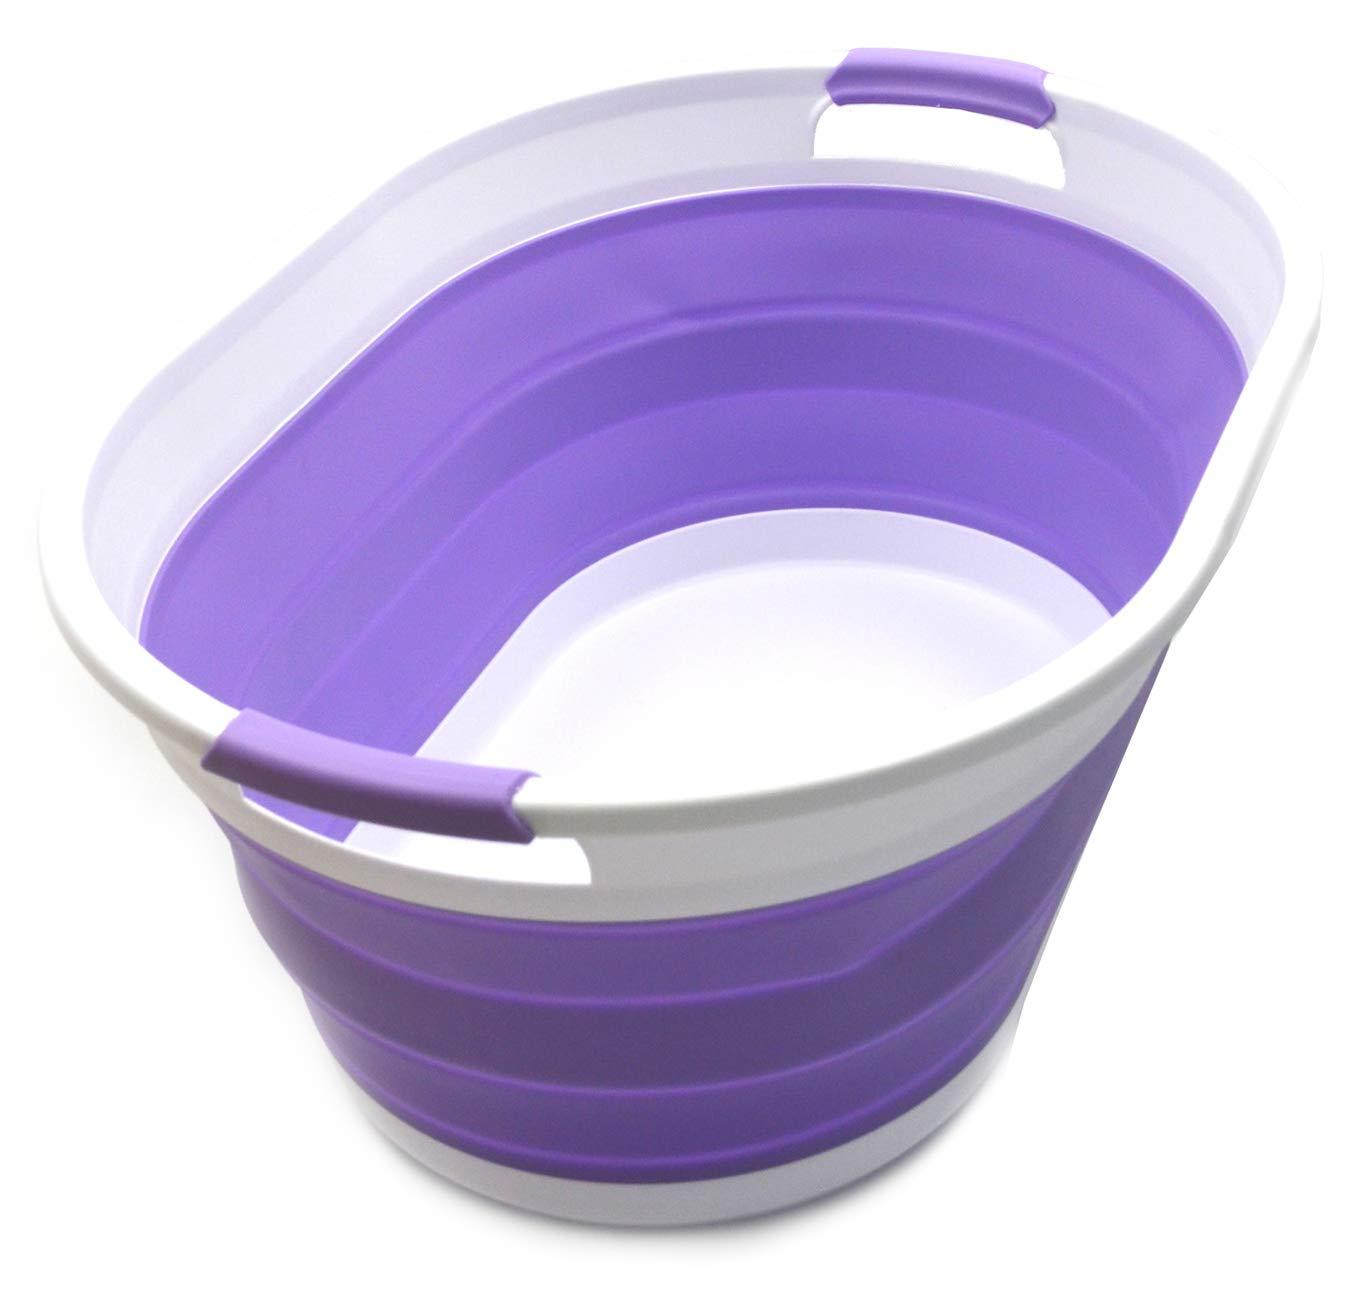 SAMMART Collapsible Plastic Laundry Basket - Oval Tub/Basket - Foldable Storage Container/Organizer - Portable Washing Tub - Space Saving Laundry Hamper (1, Lt. Purple) by SAMMART